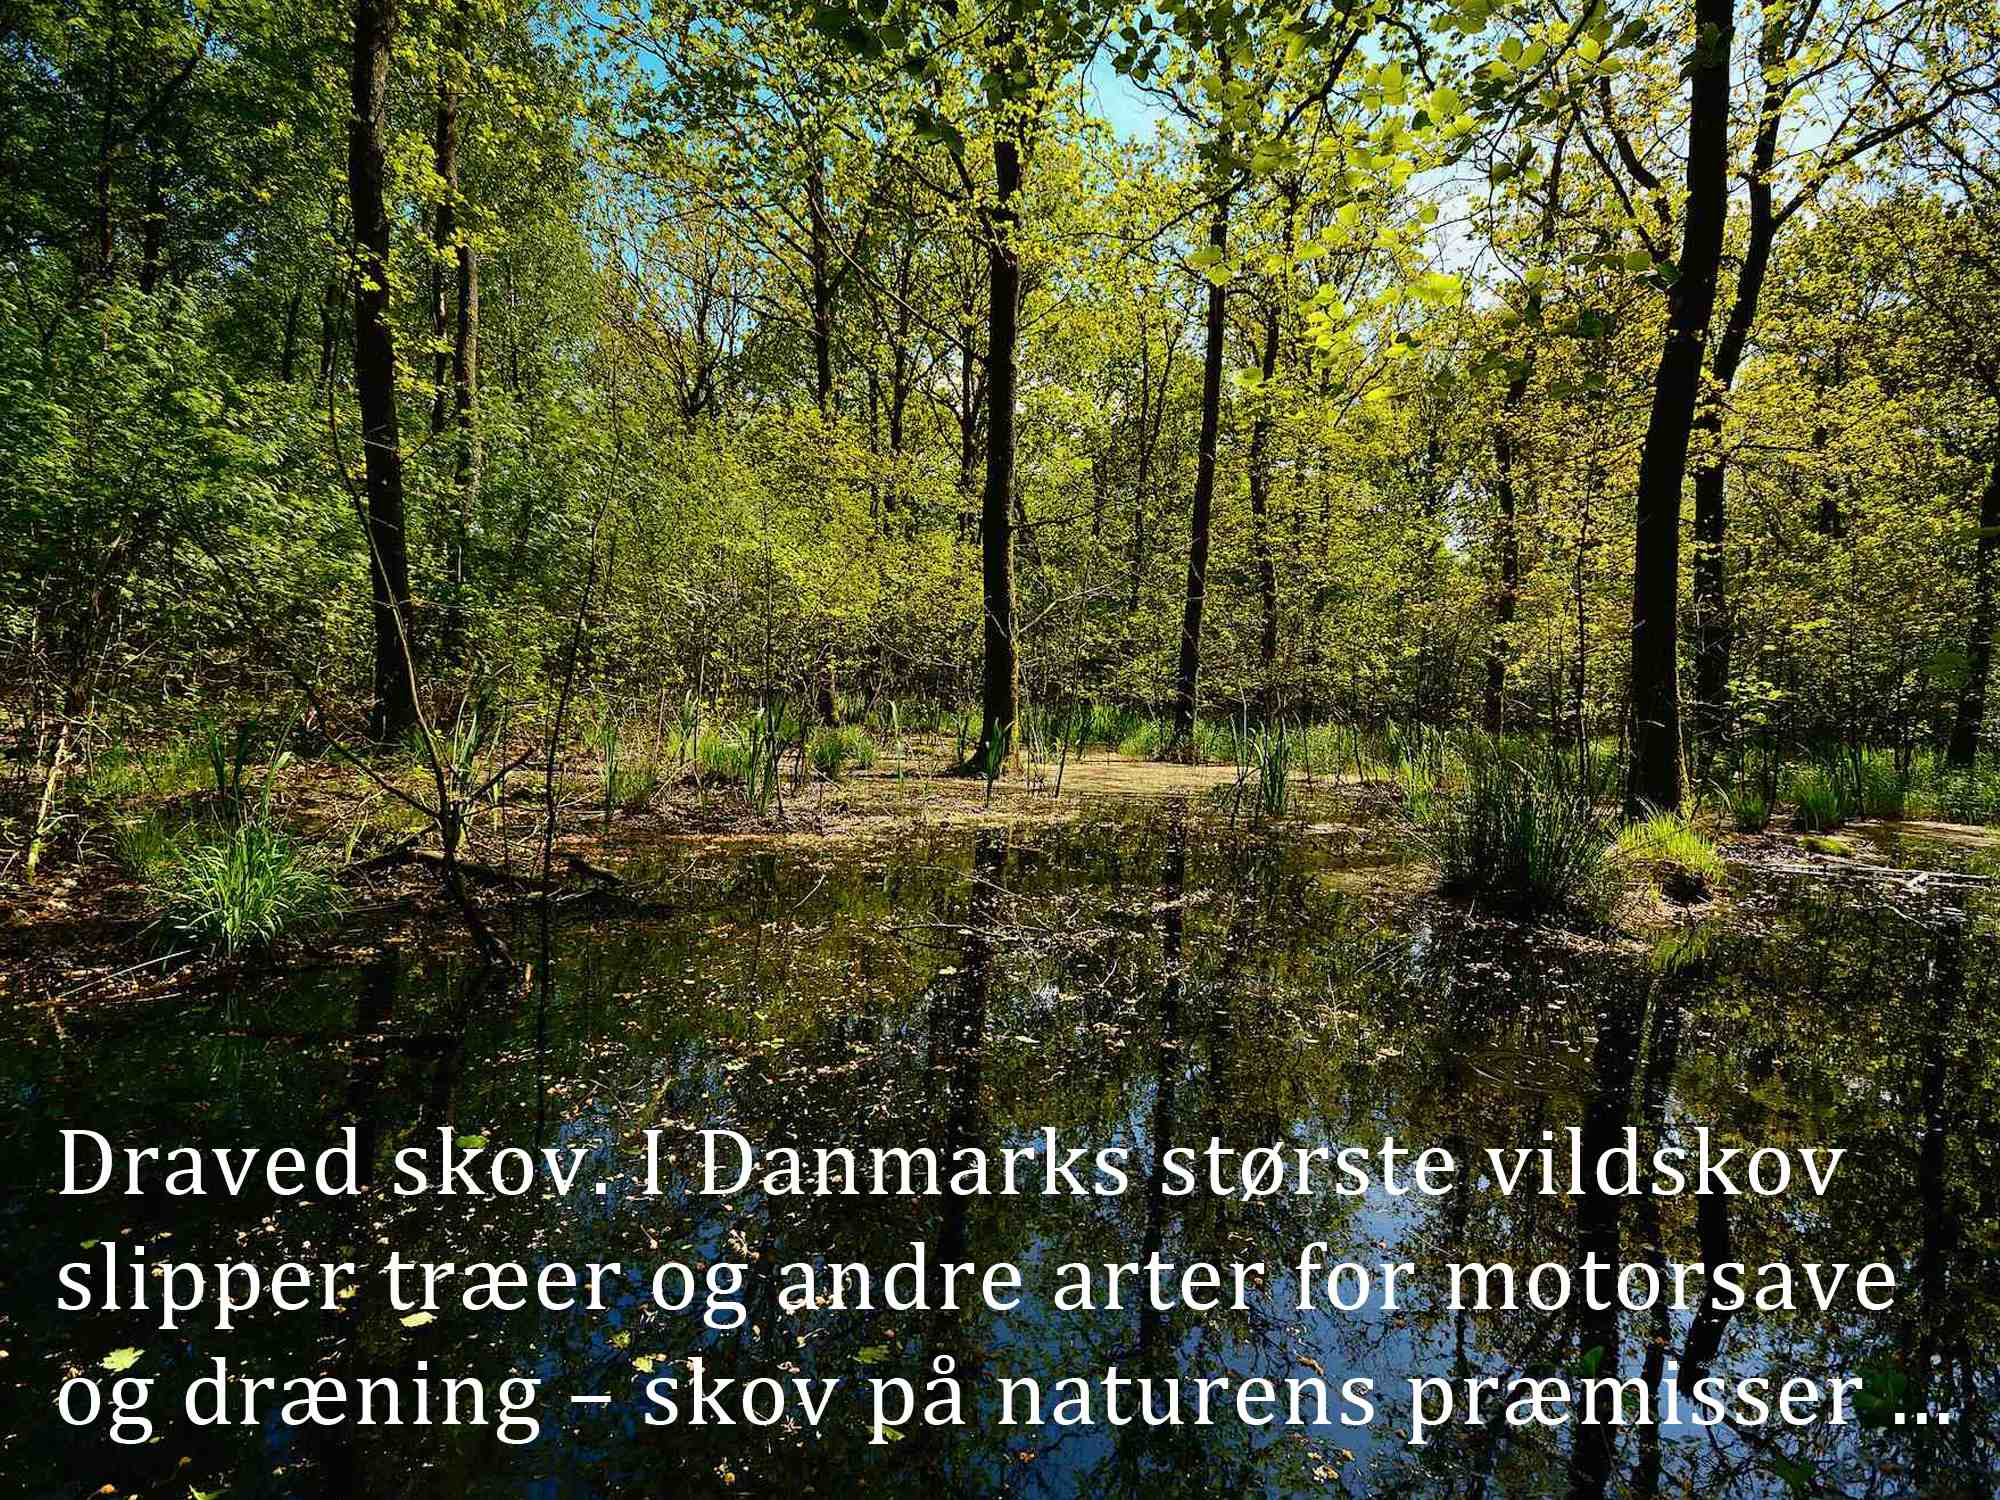 Draved Skov. I Danmarks største vildskov slipper træer og andre arter for motorsave og dræning ...